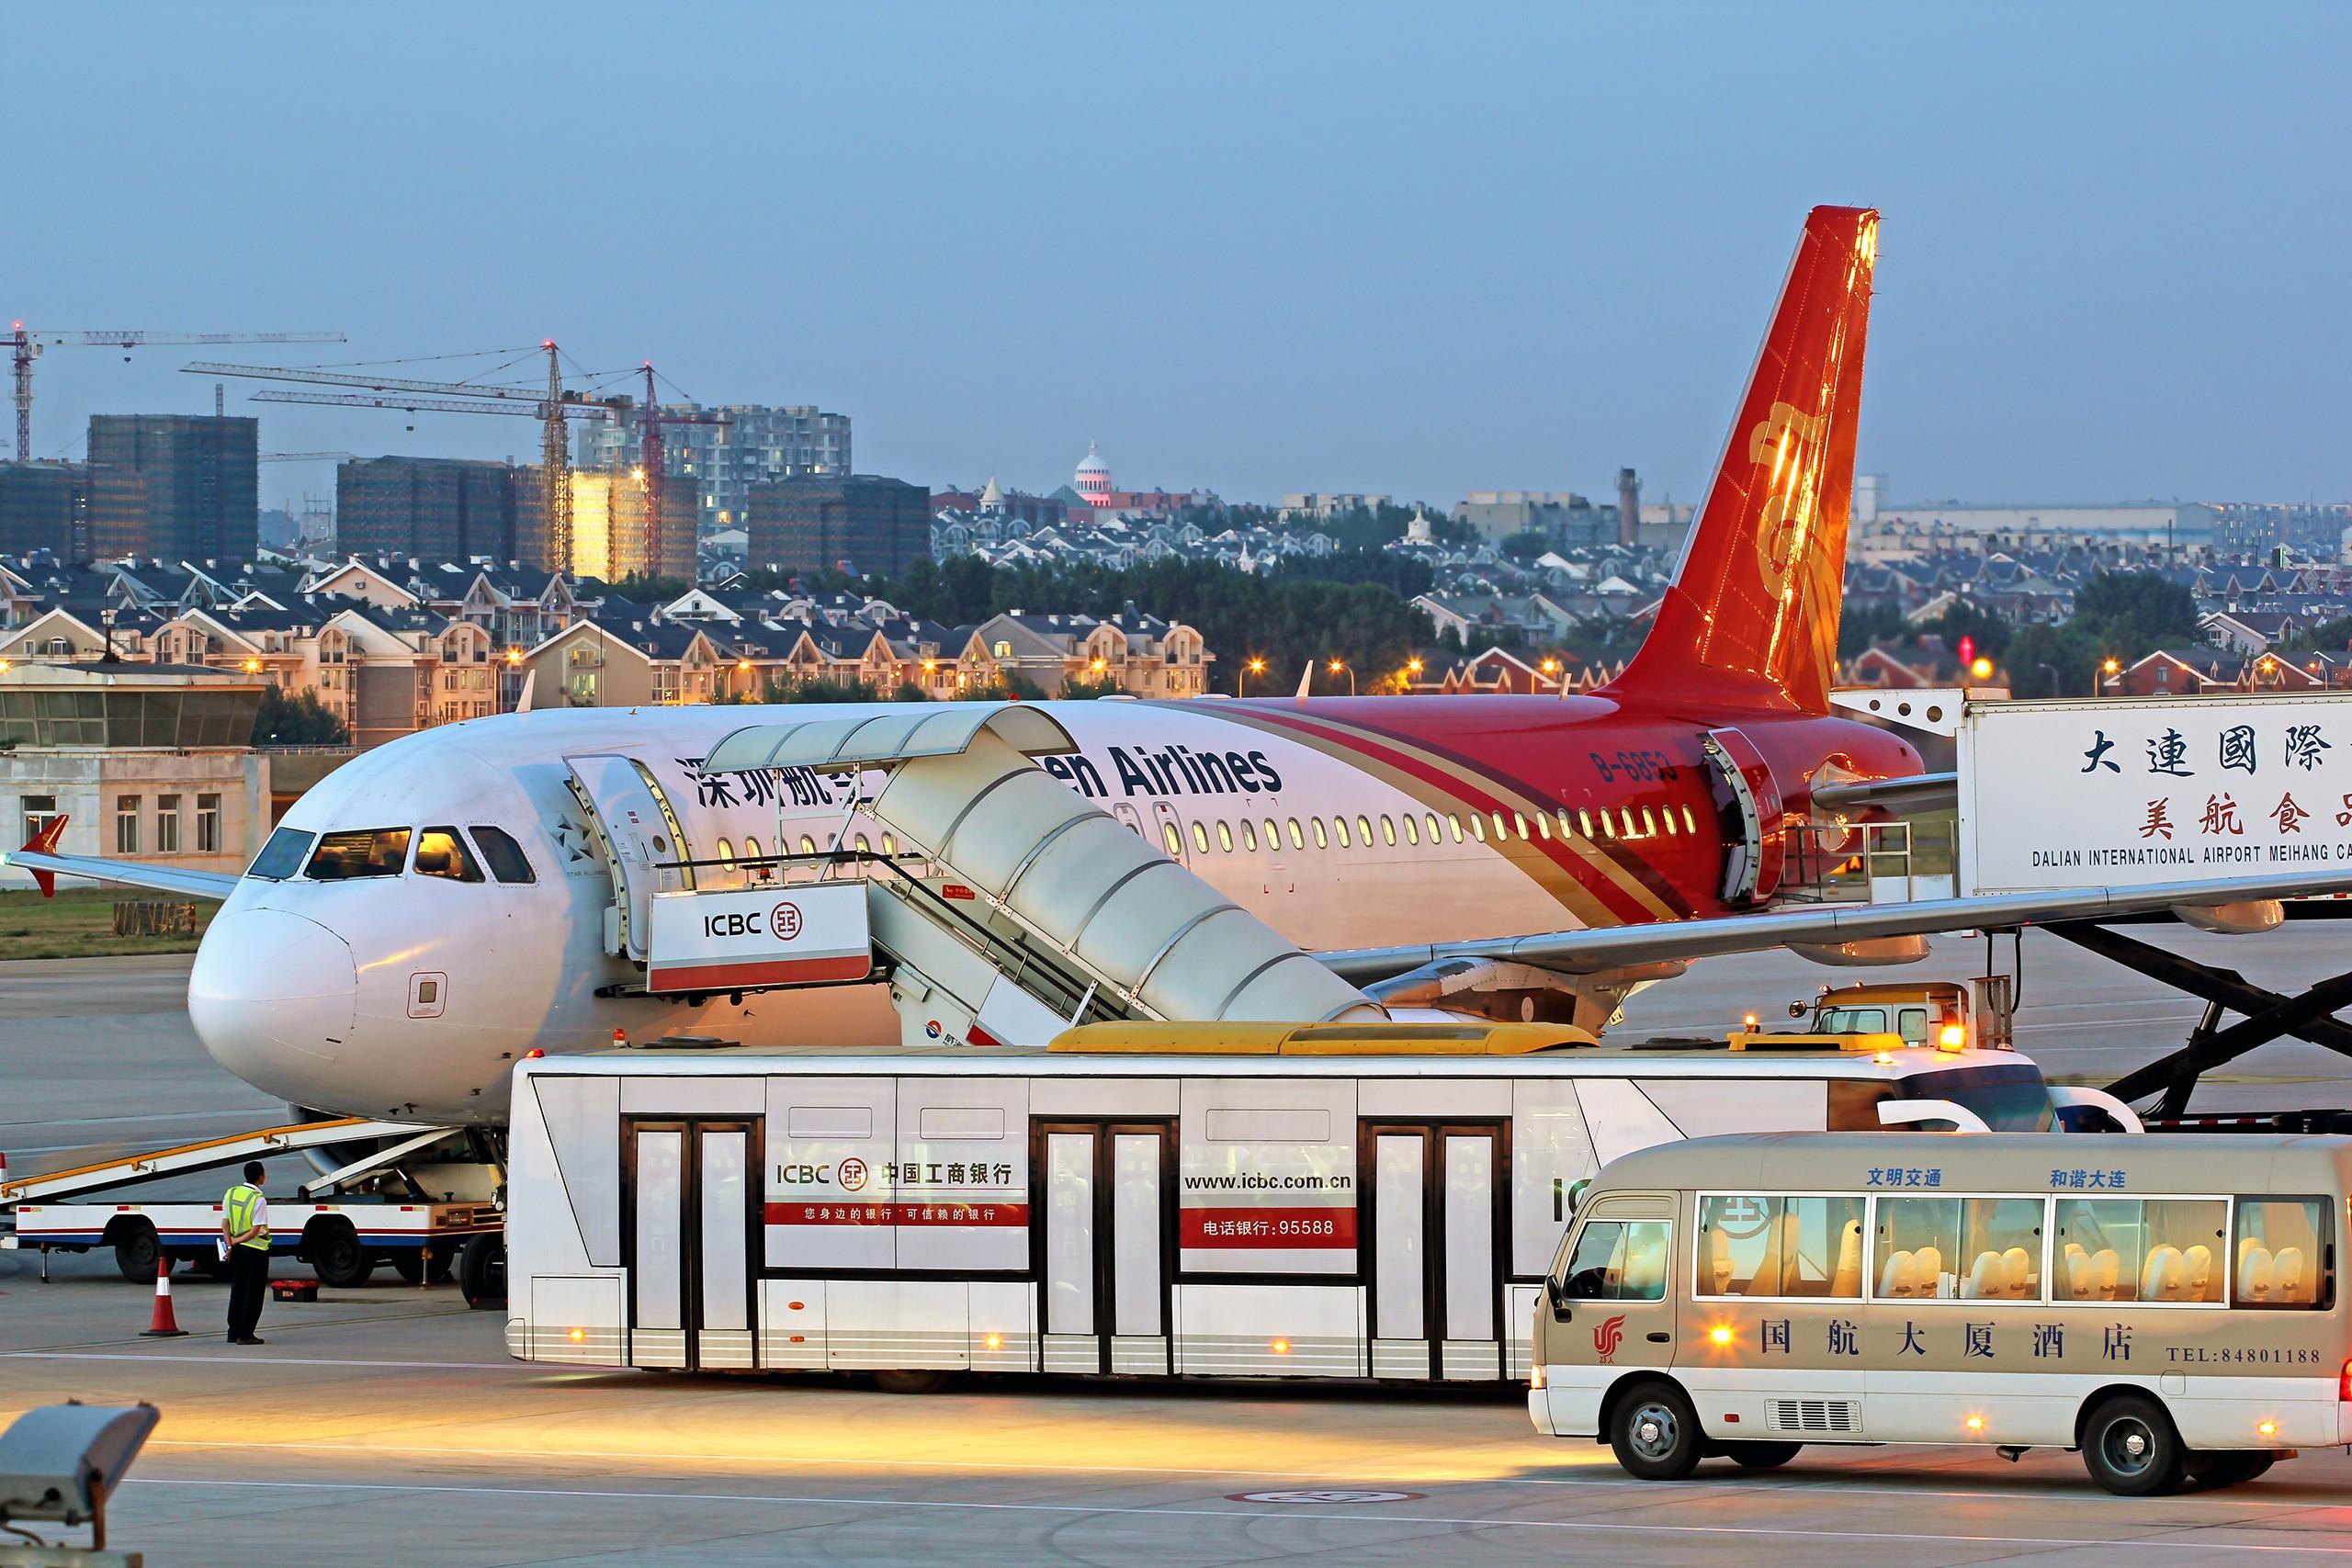 Re:[原创][DLC]...窄体机...2560x1707}Pix AIRBUS A320-200 B-6853 中国大连周水子国际机场